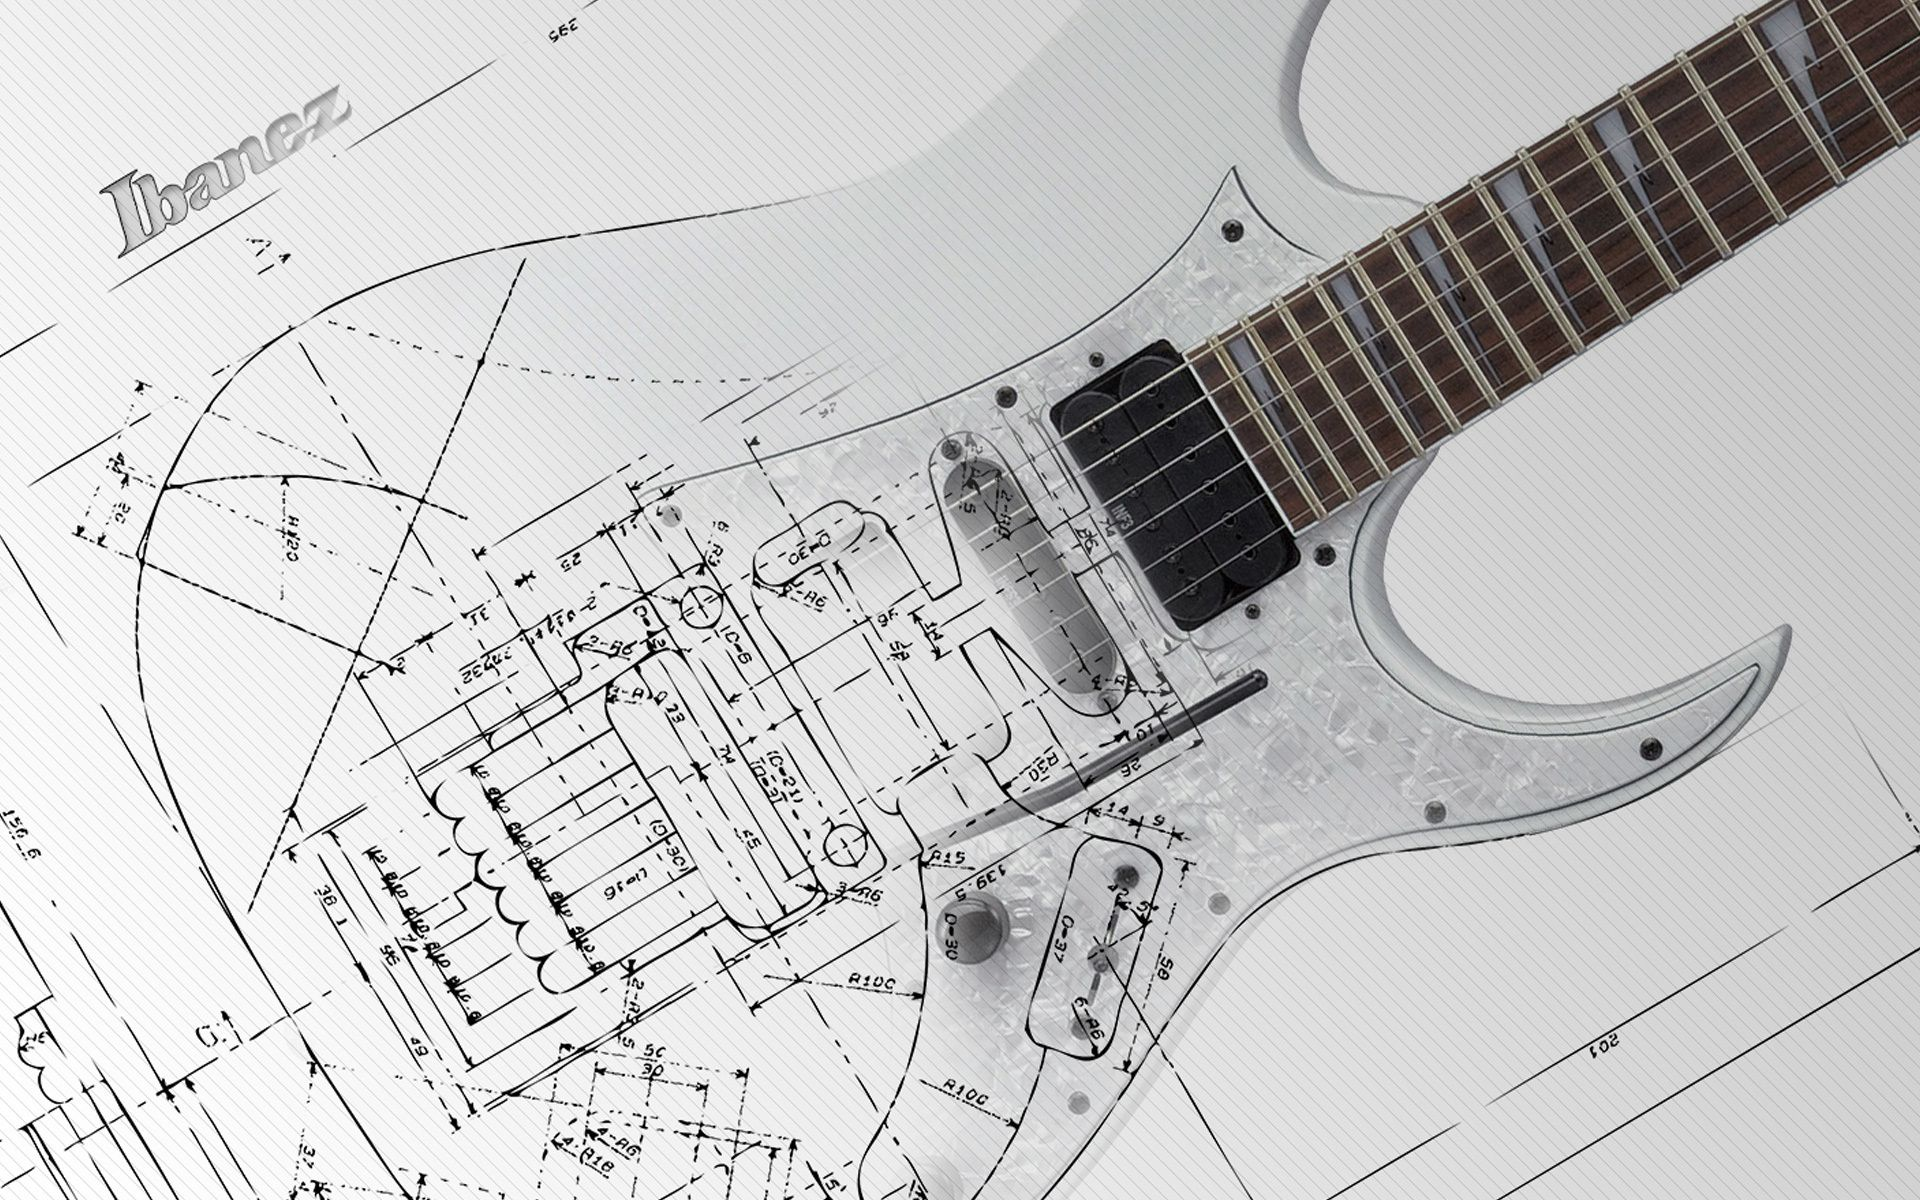 ibanez white electric guitar blueprint guitars in 2019 guitar guitar drawing ibanez. Black Bedroom Furniture Sets. Home Design Ideas